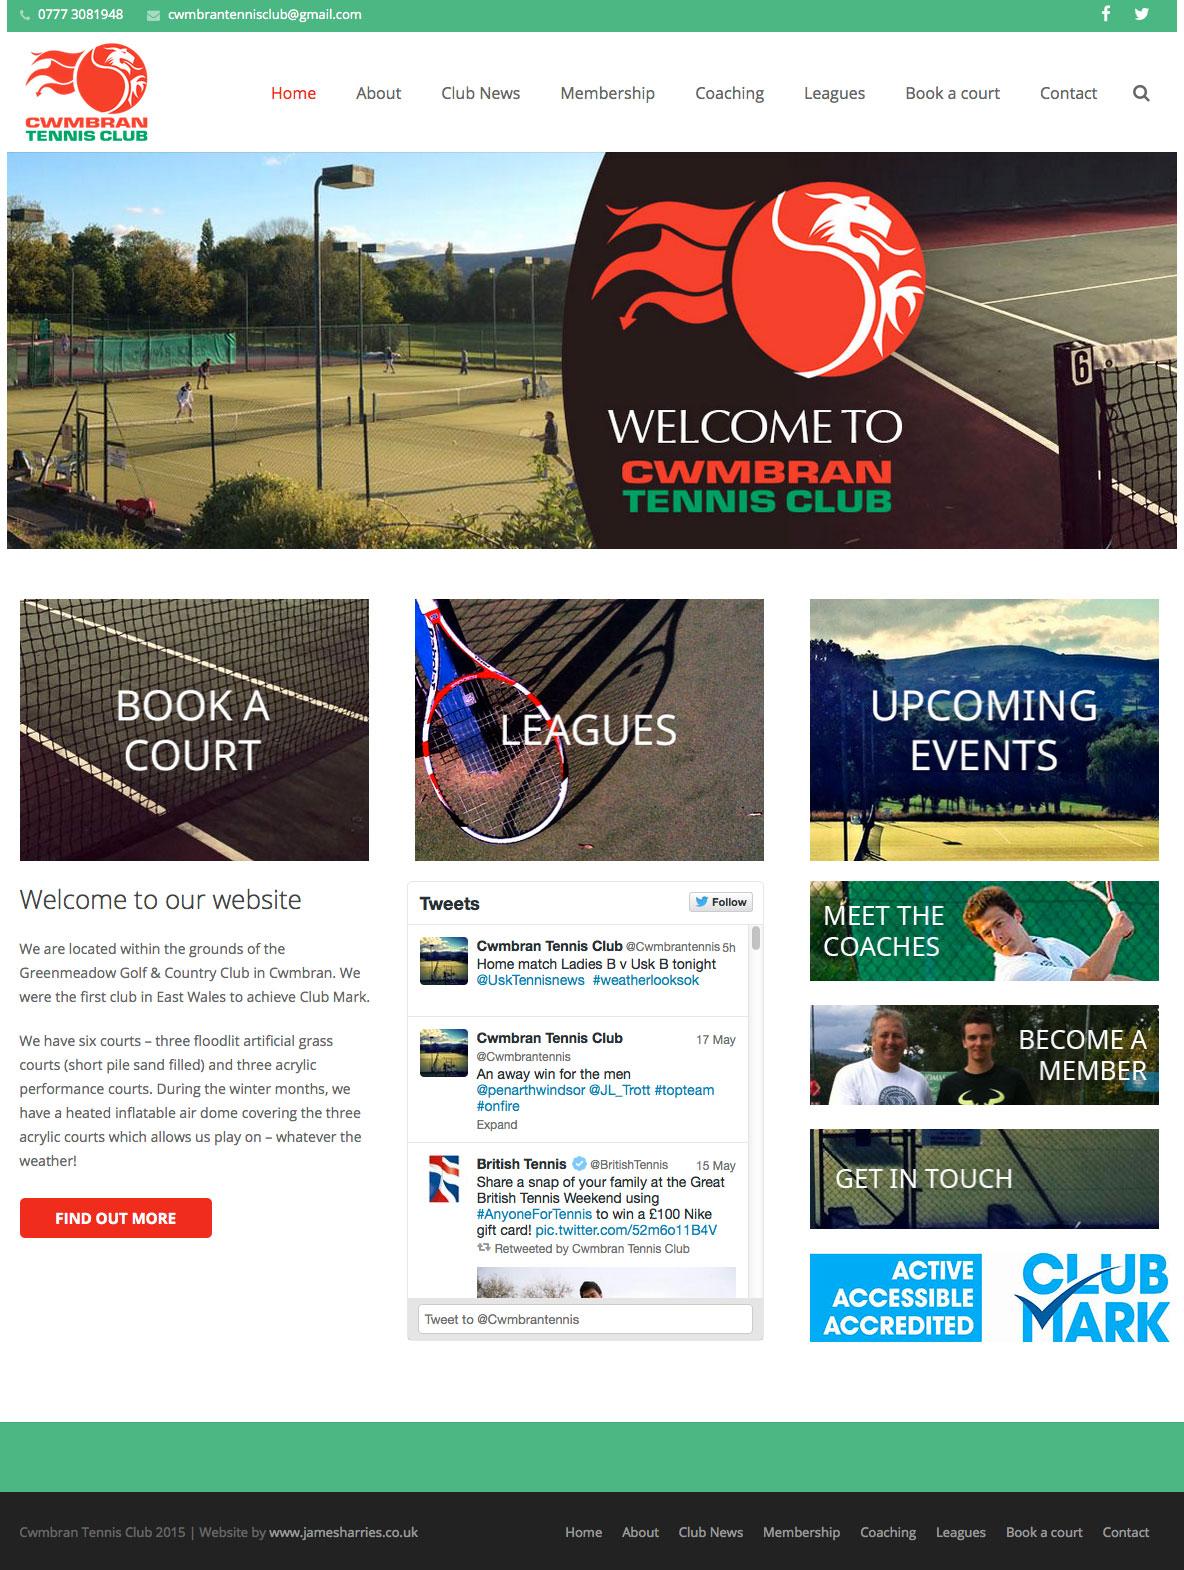 Cwmbran Tennis